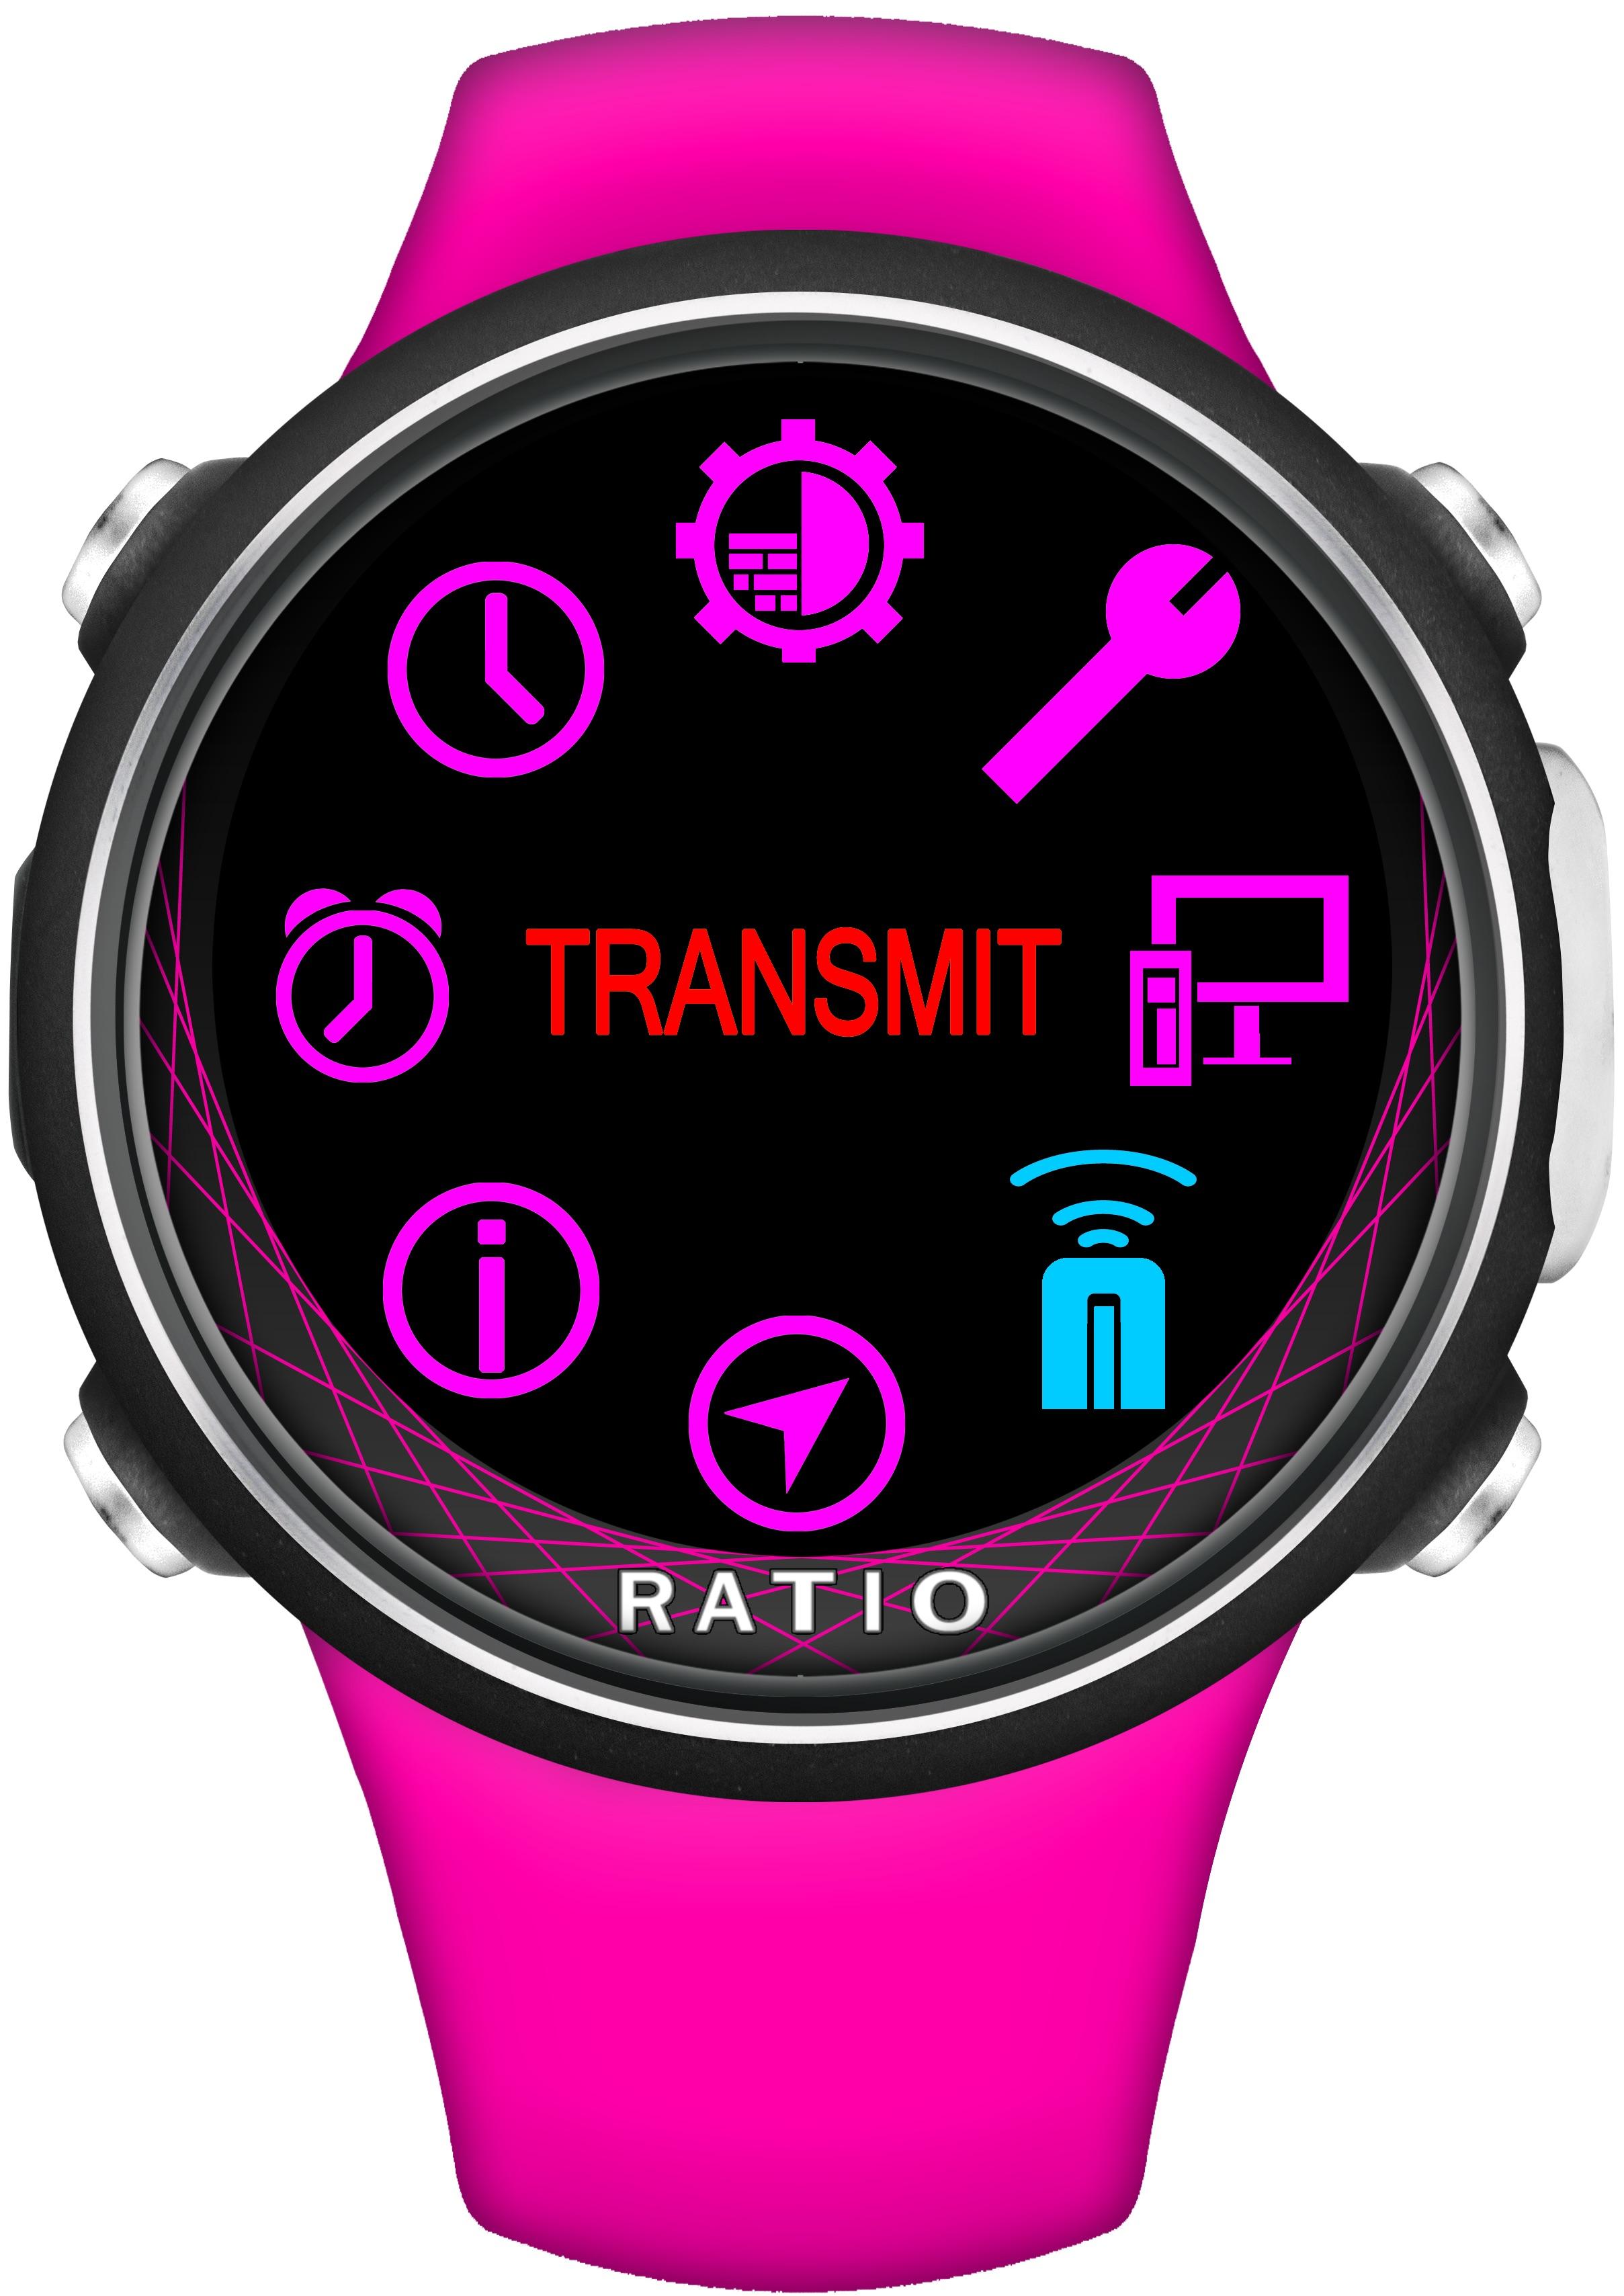 Ratio iDive Tech+ Color